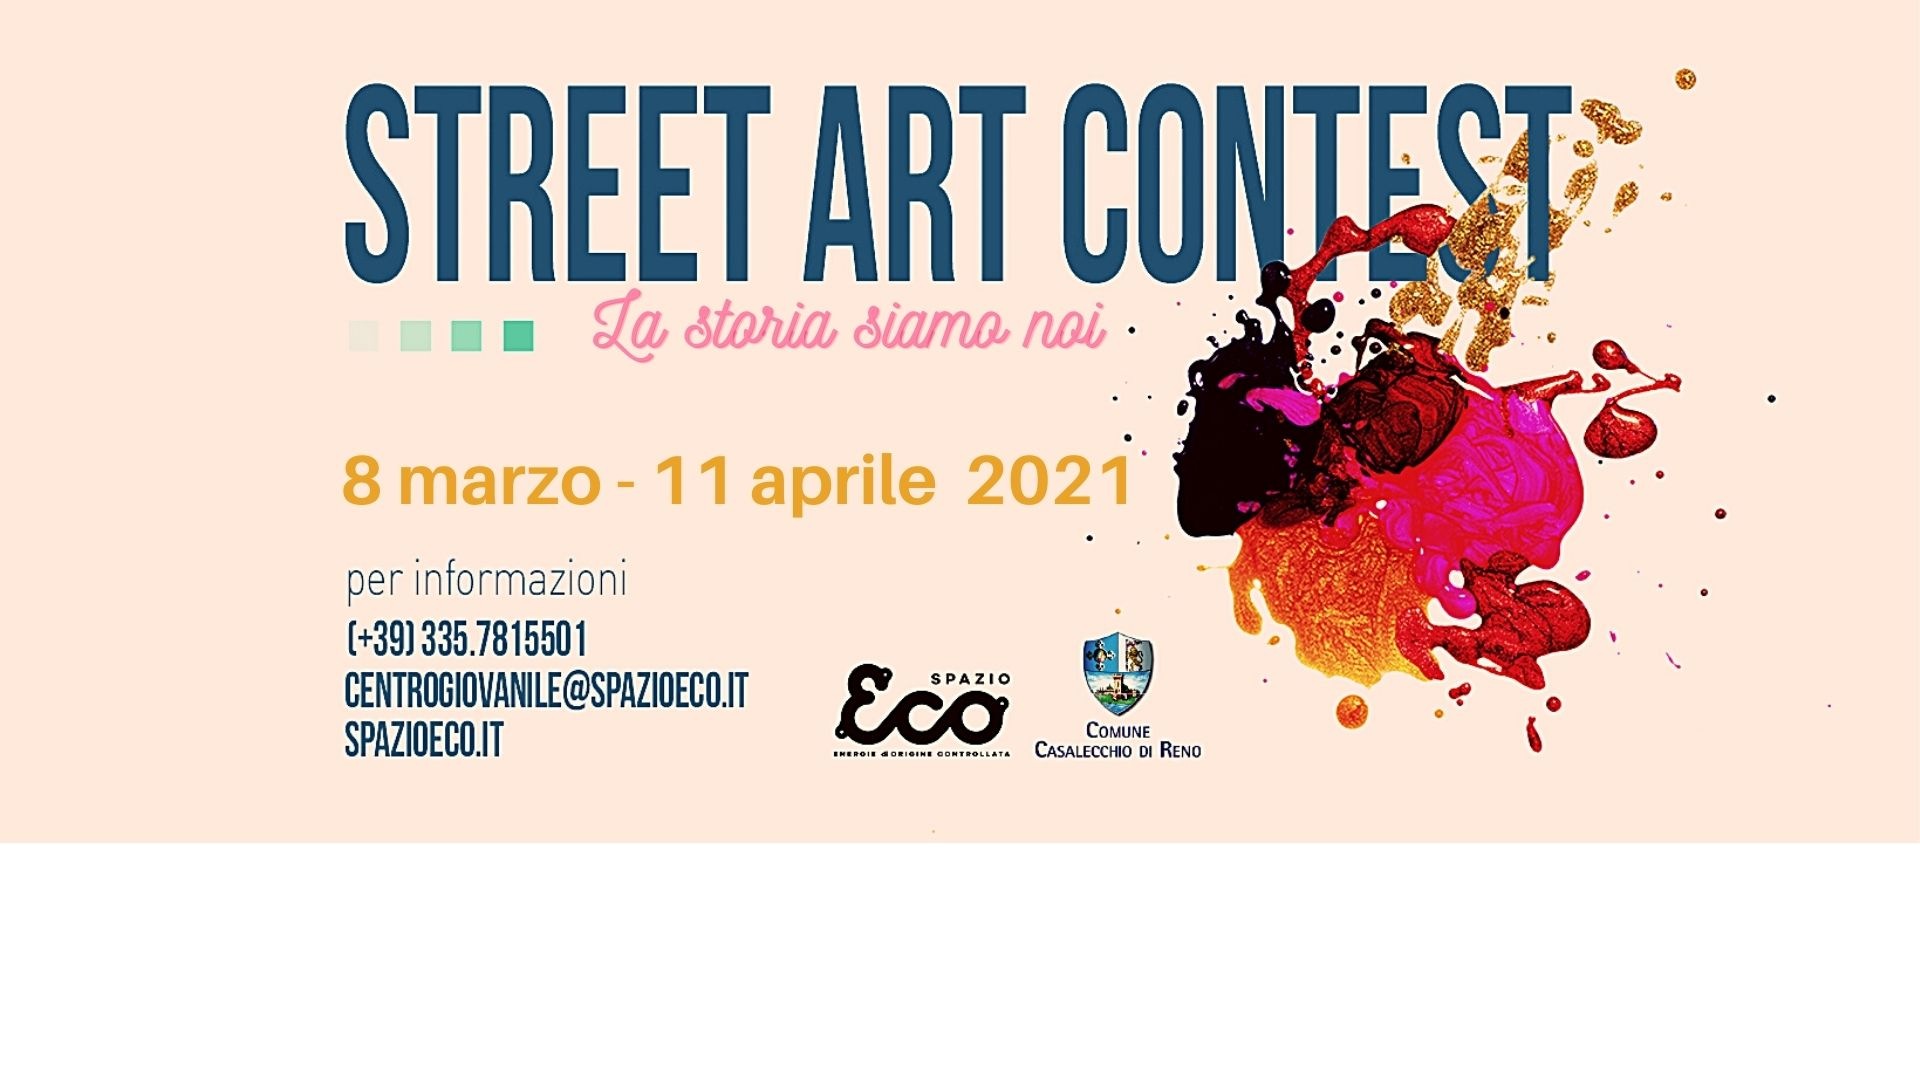 Street Art Contest 2021 – La storia siamo noi